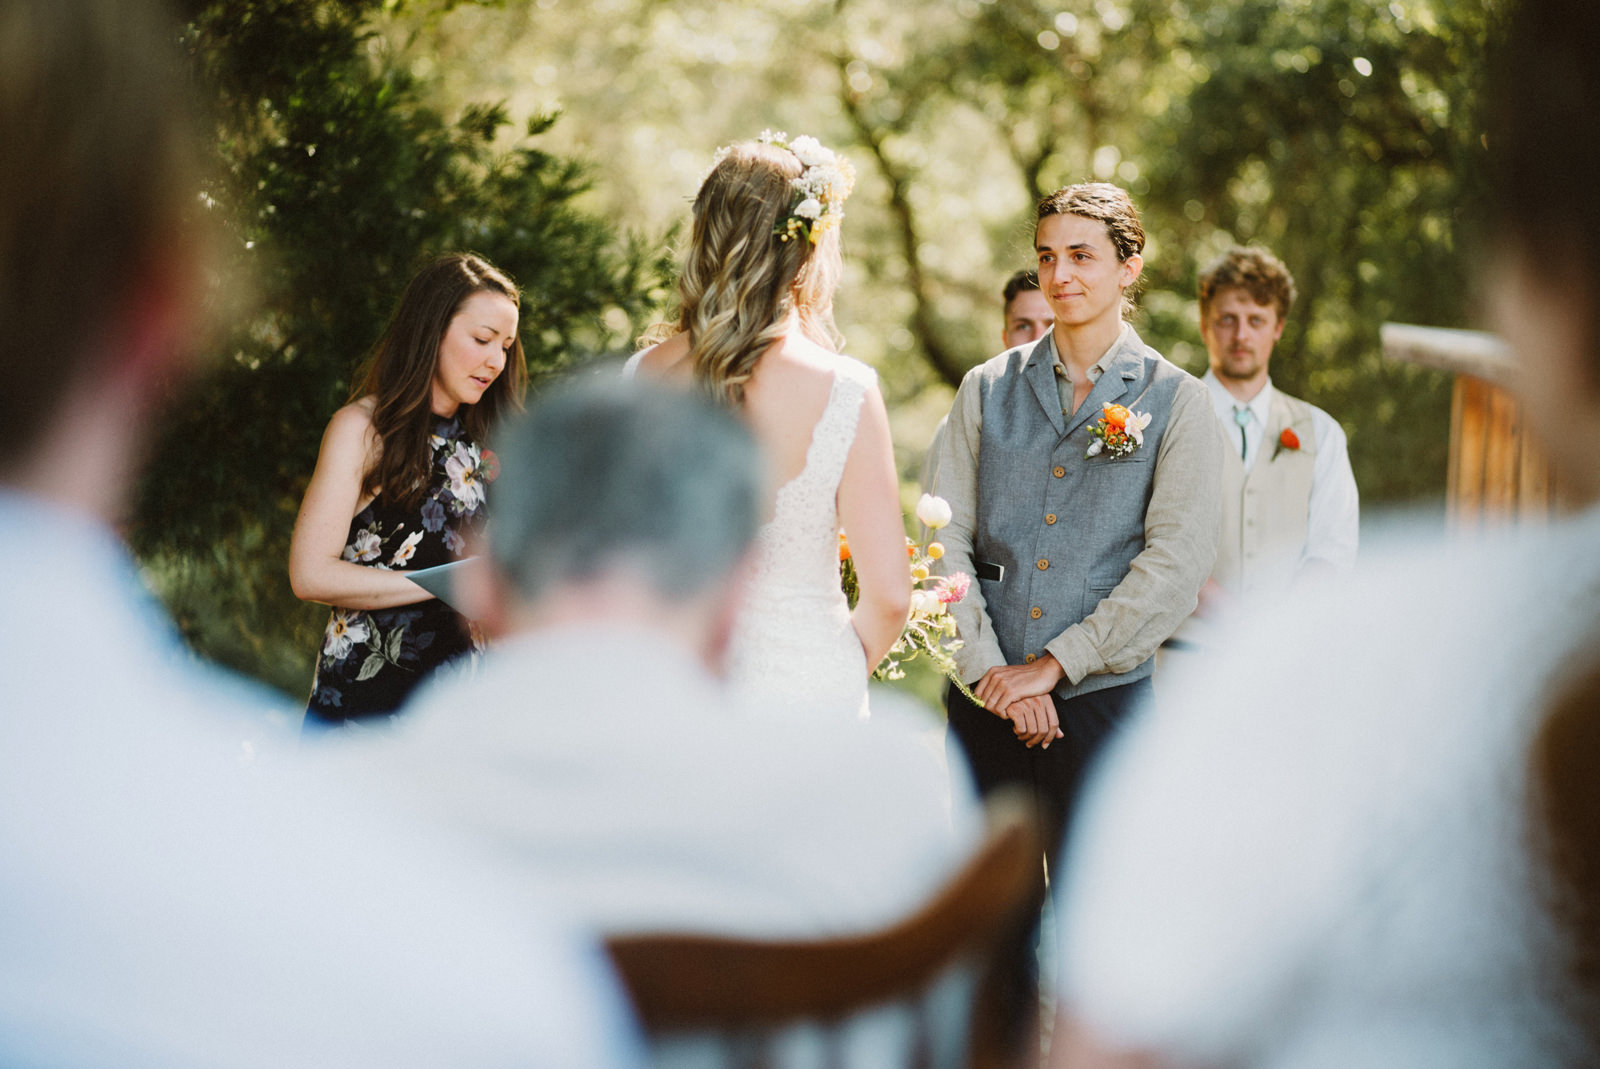 rivers-bend-retreat-wedding-025 RIVER'S BEND RETREAT WEDDING